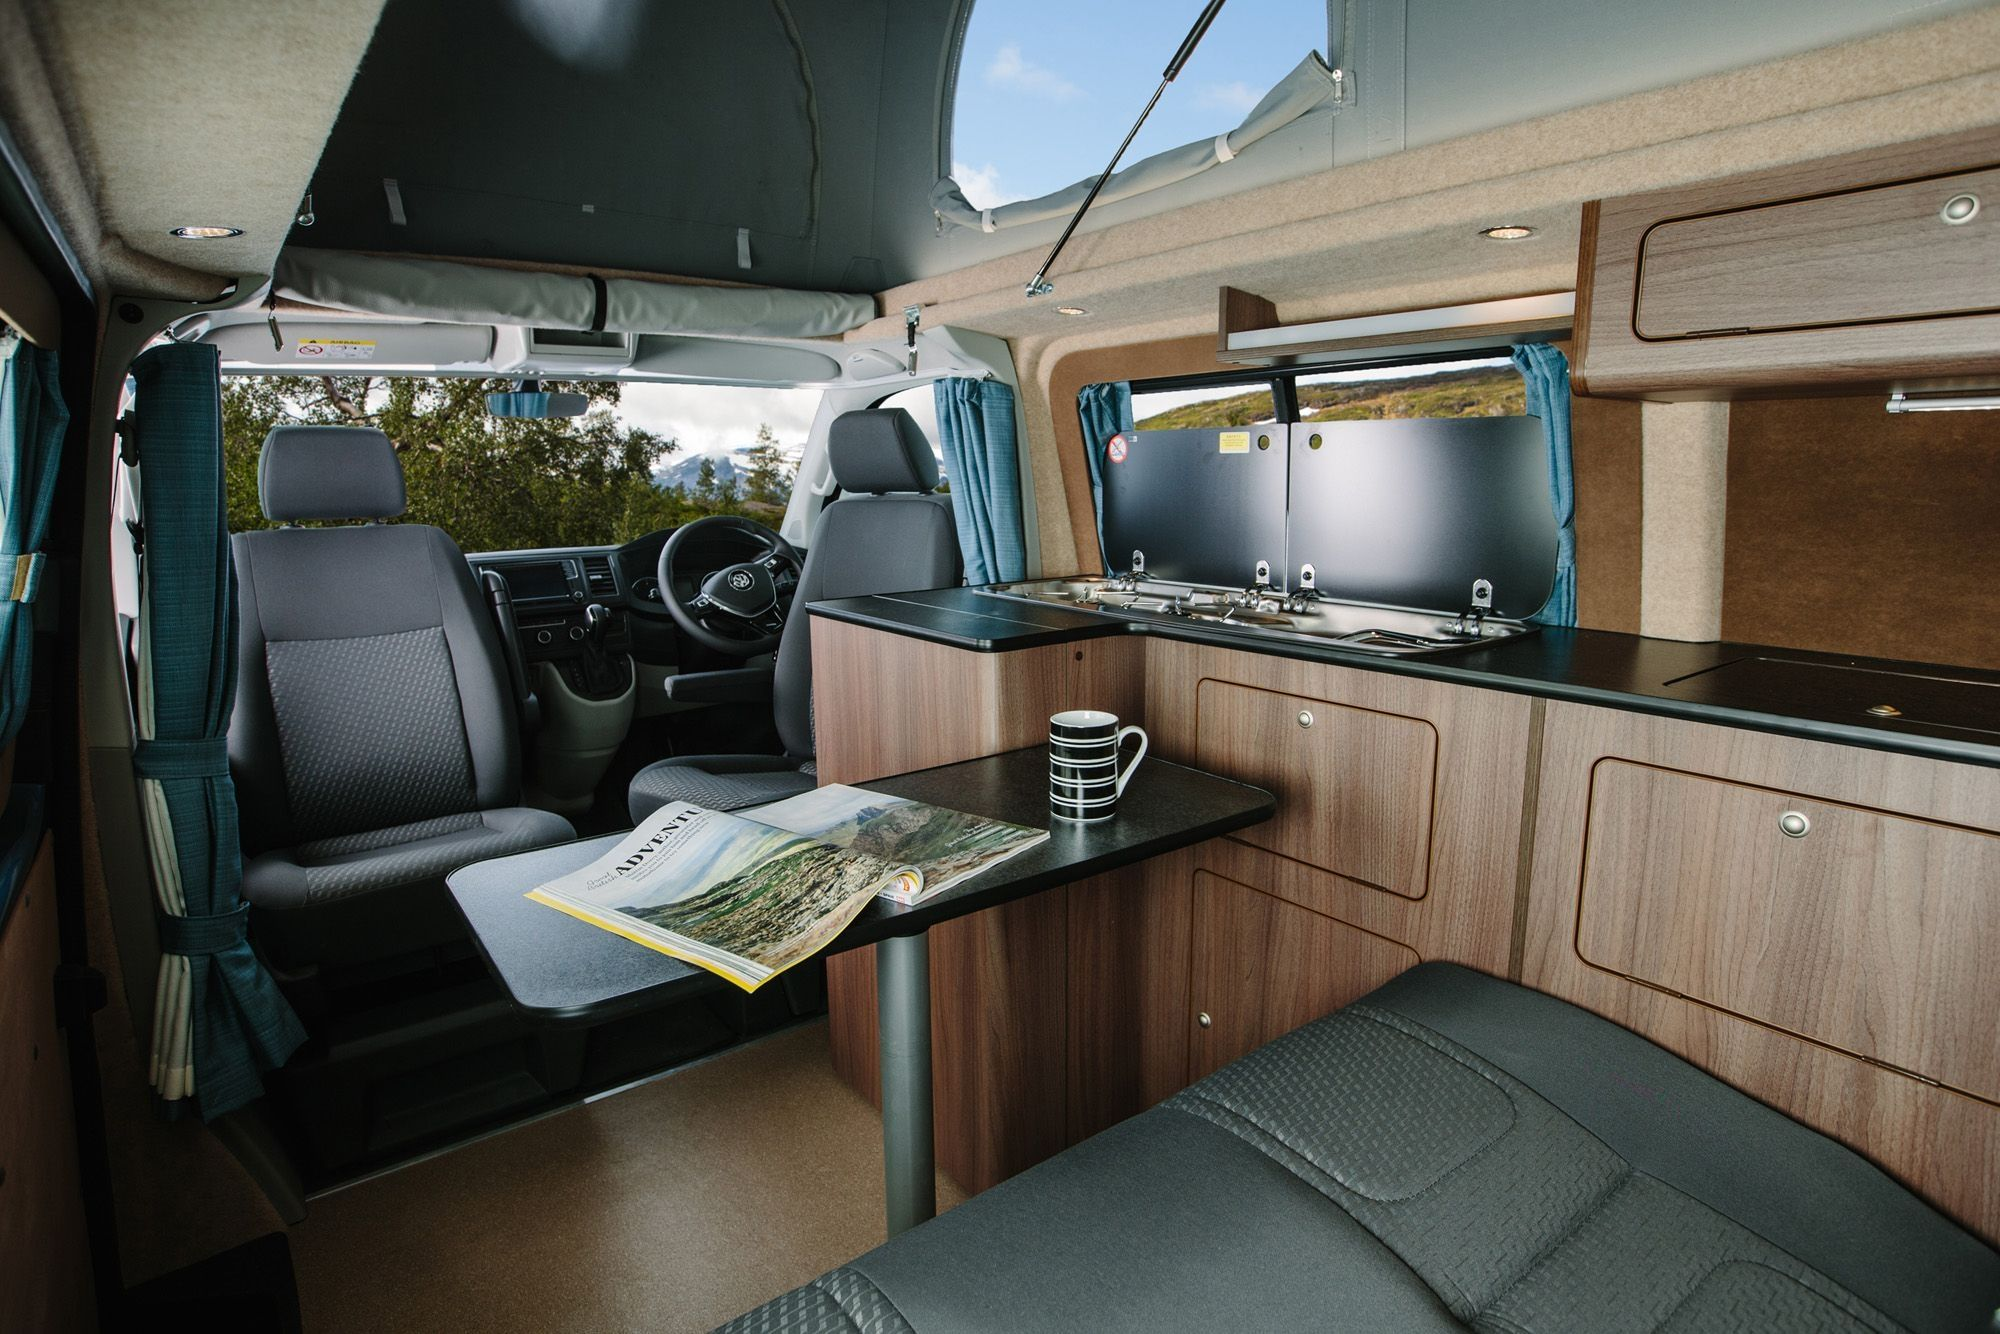 30 Inspiration Photo Of Volkswagen Camper Interior Camper Ideas In 2020 Volkswagen Interior Camper Interior Campervan Interior